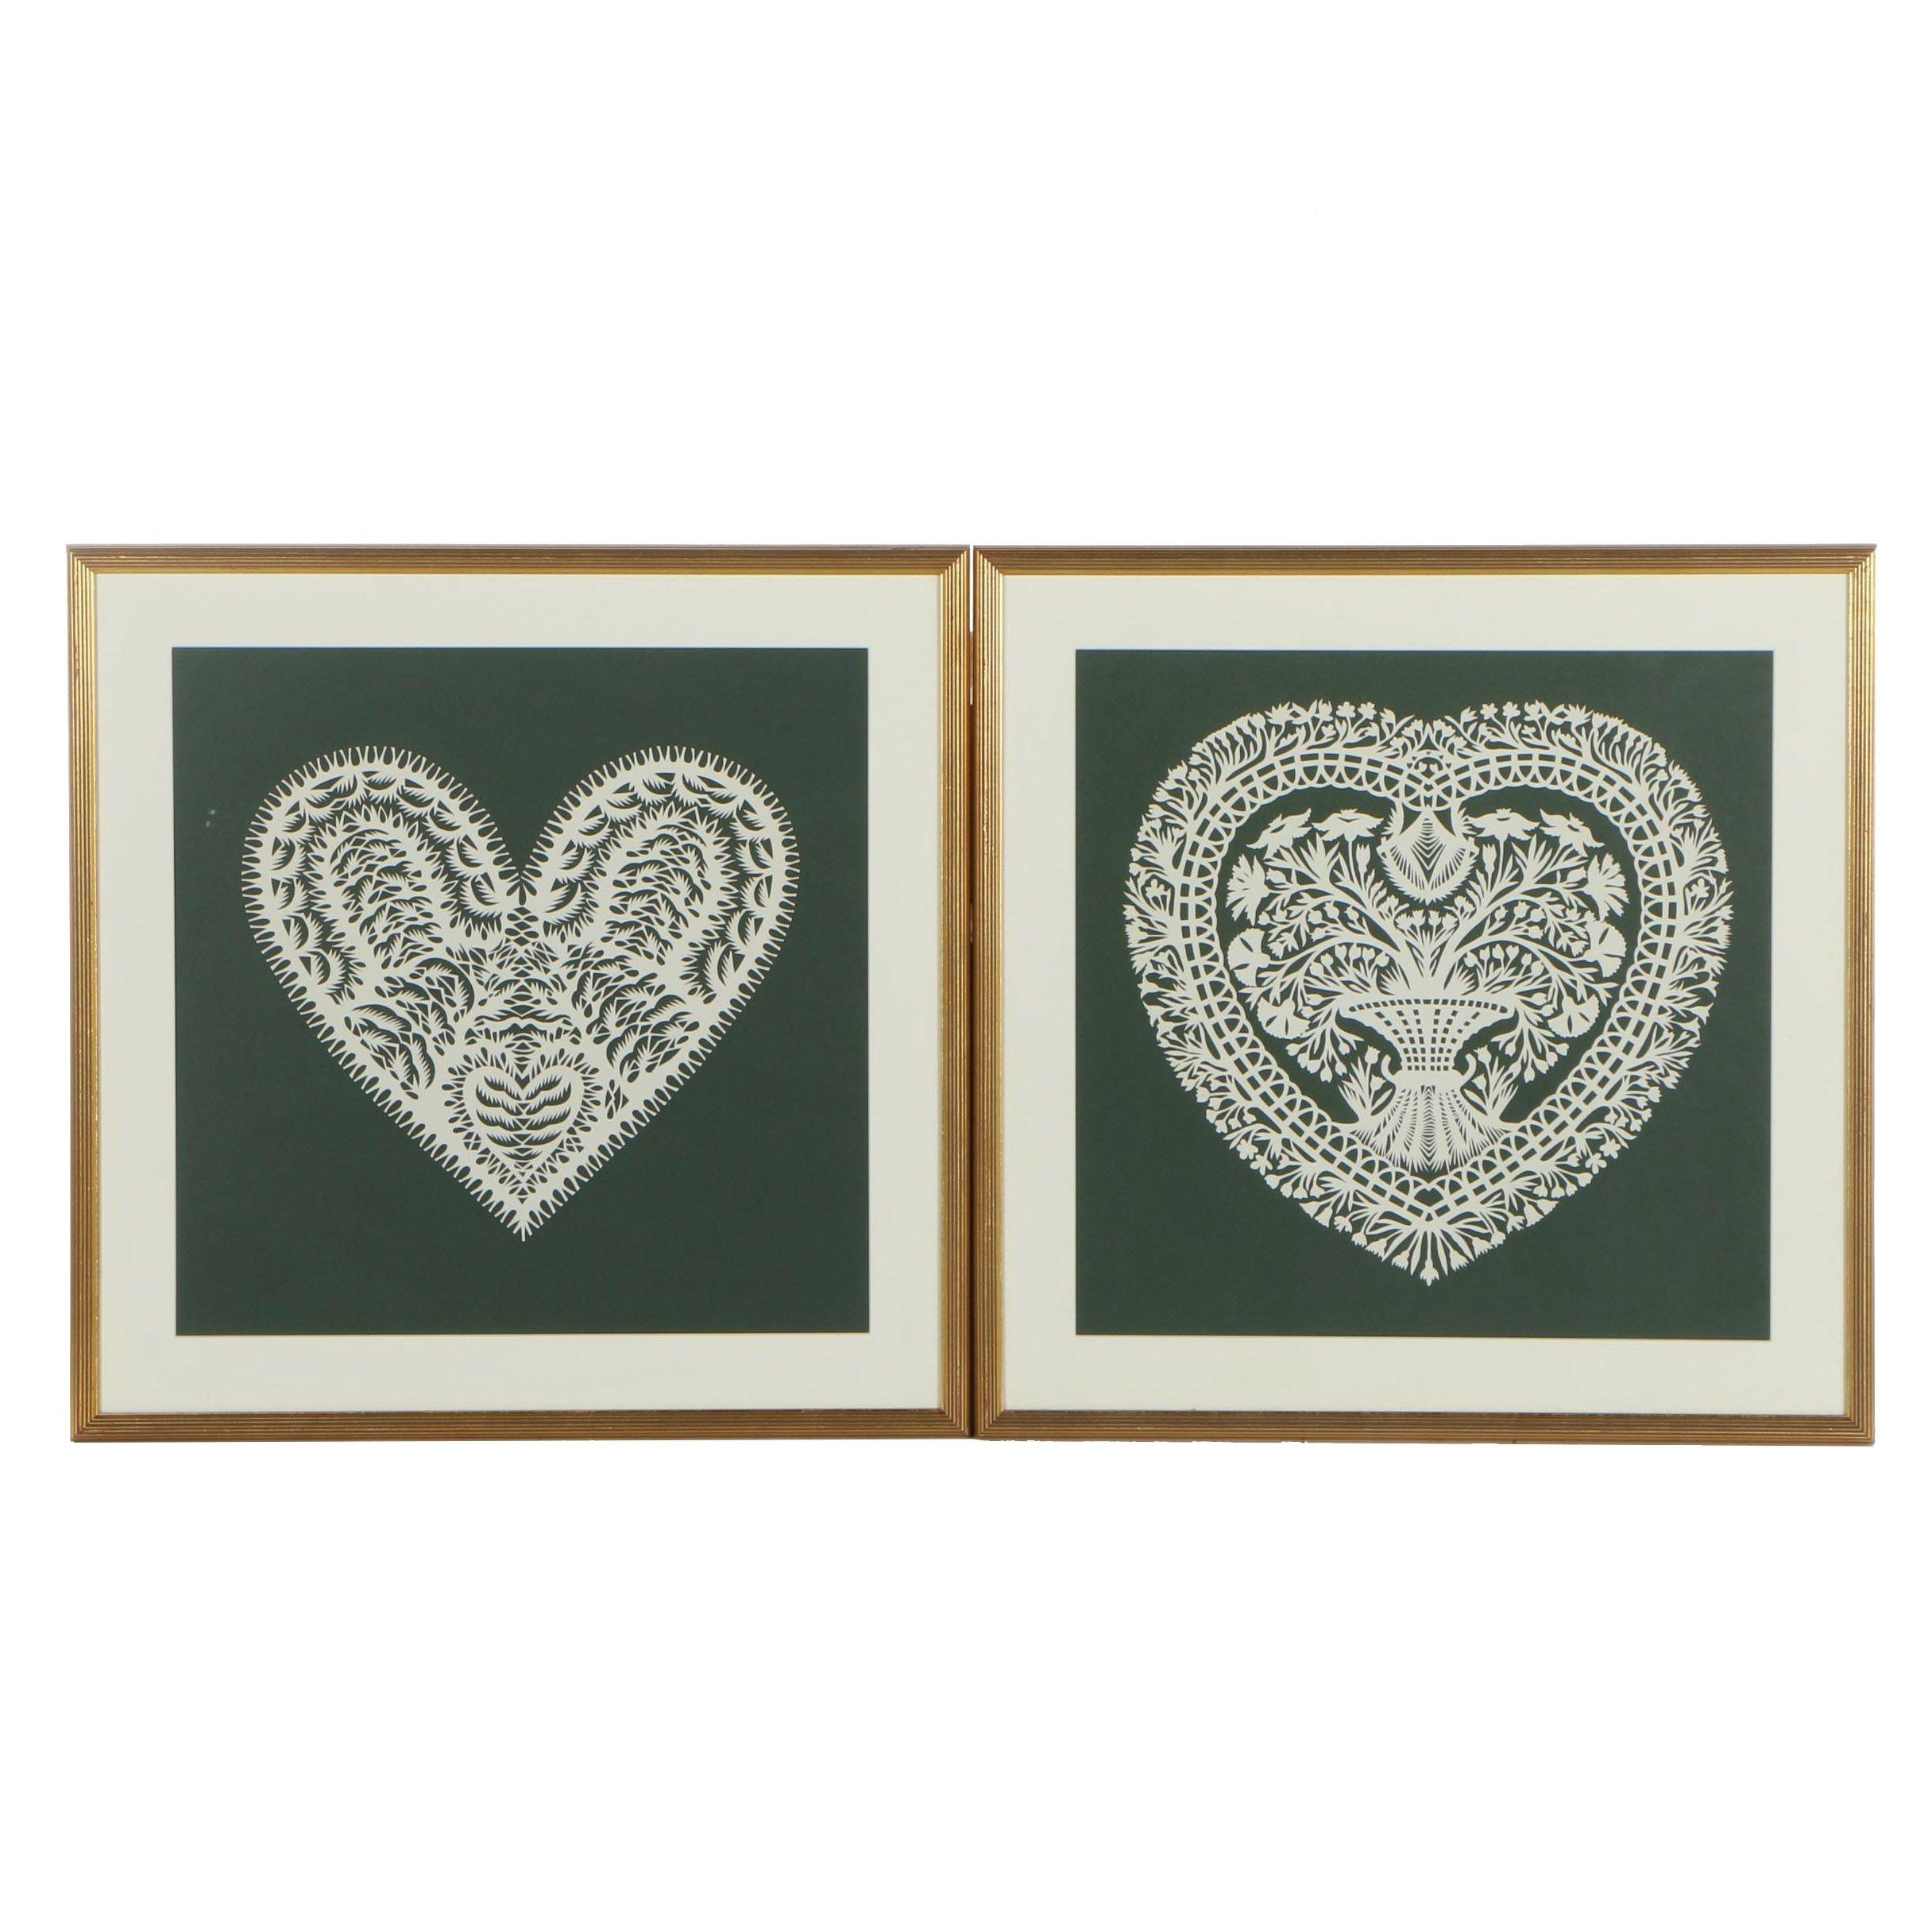 Framed Scherenschnitte Paper Hearts